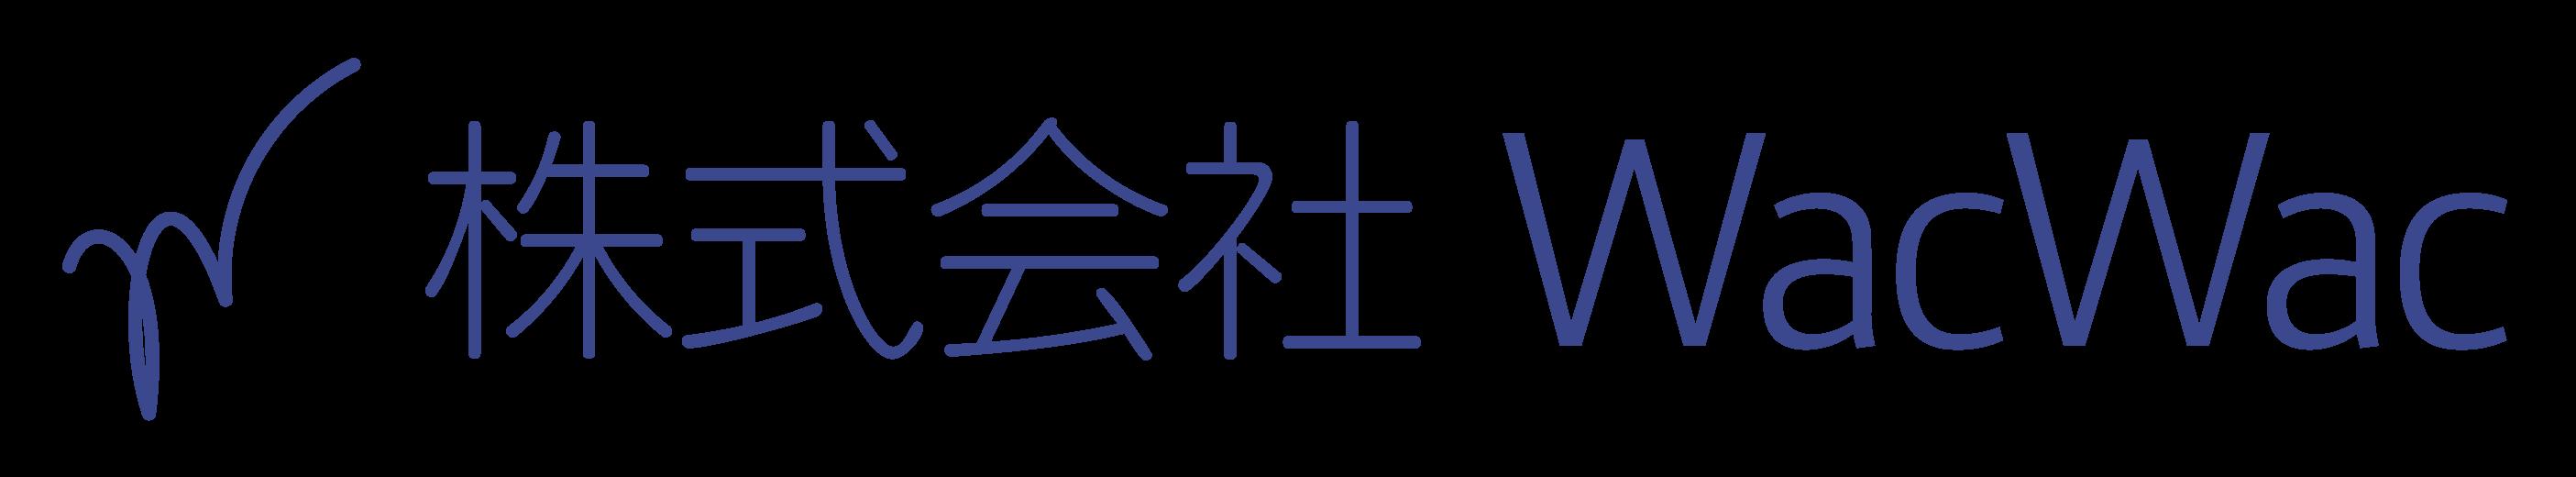 株式会社 WacWac